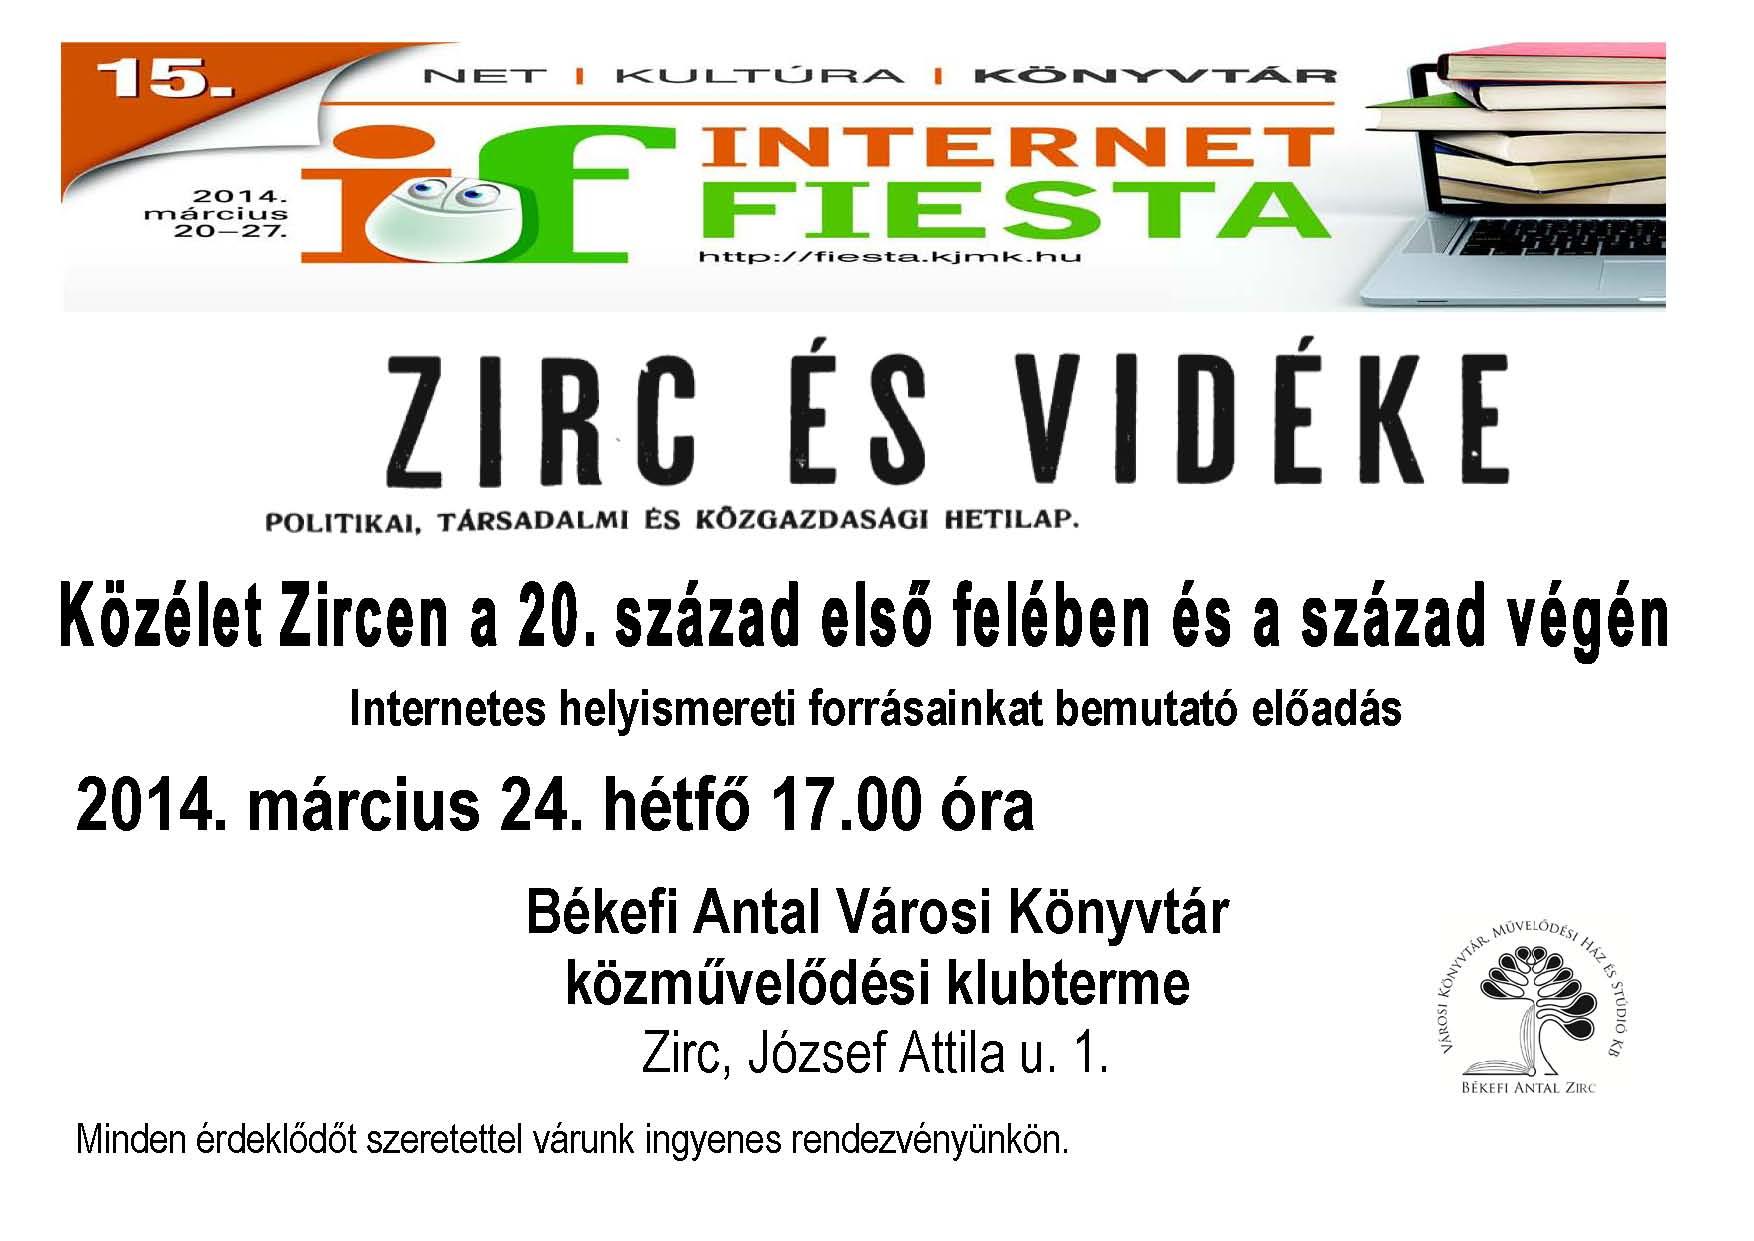 Internet fiesta.jpg